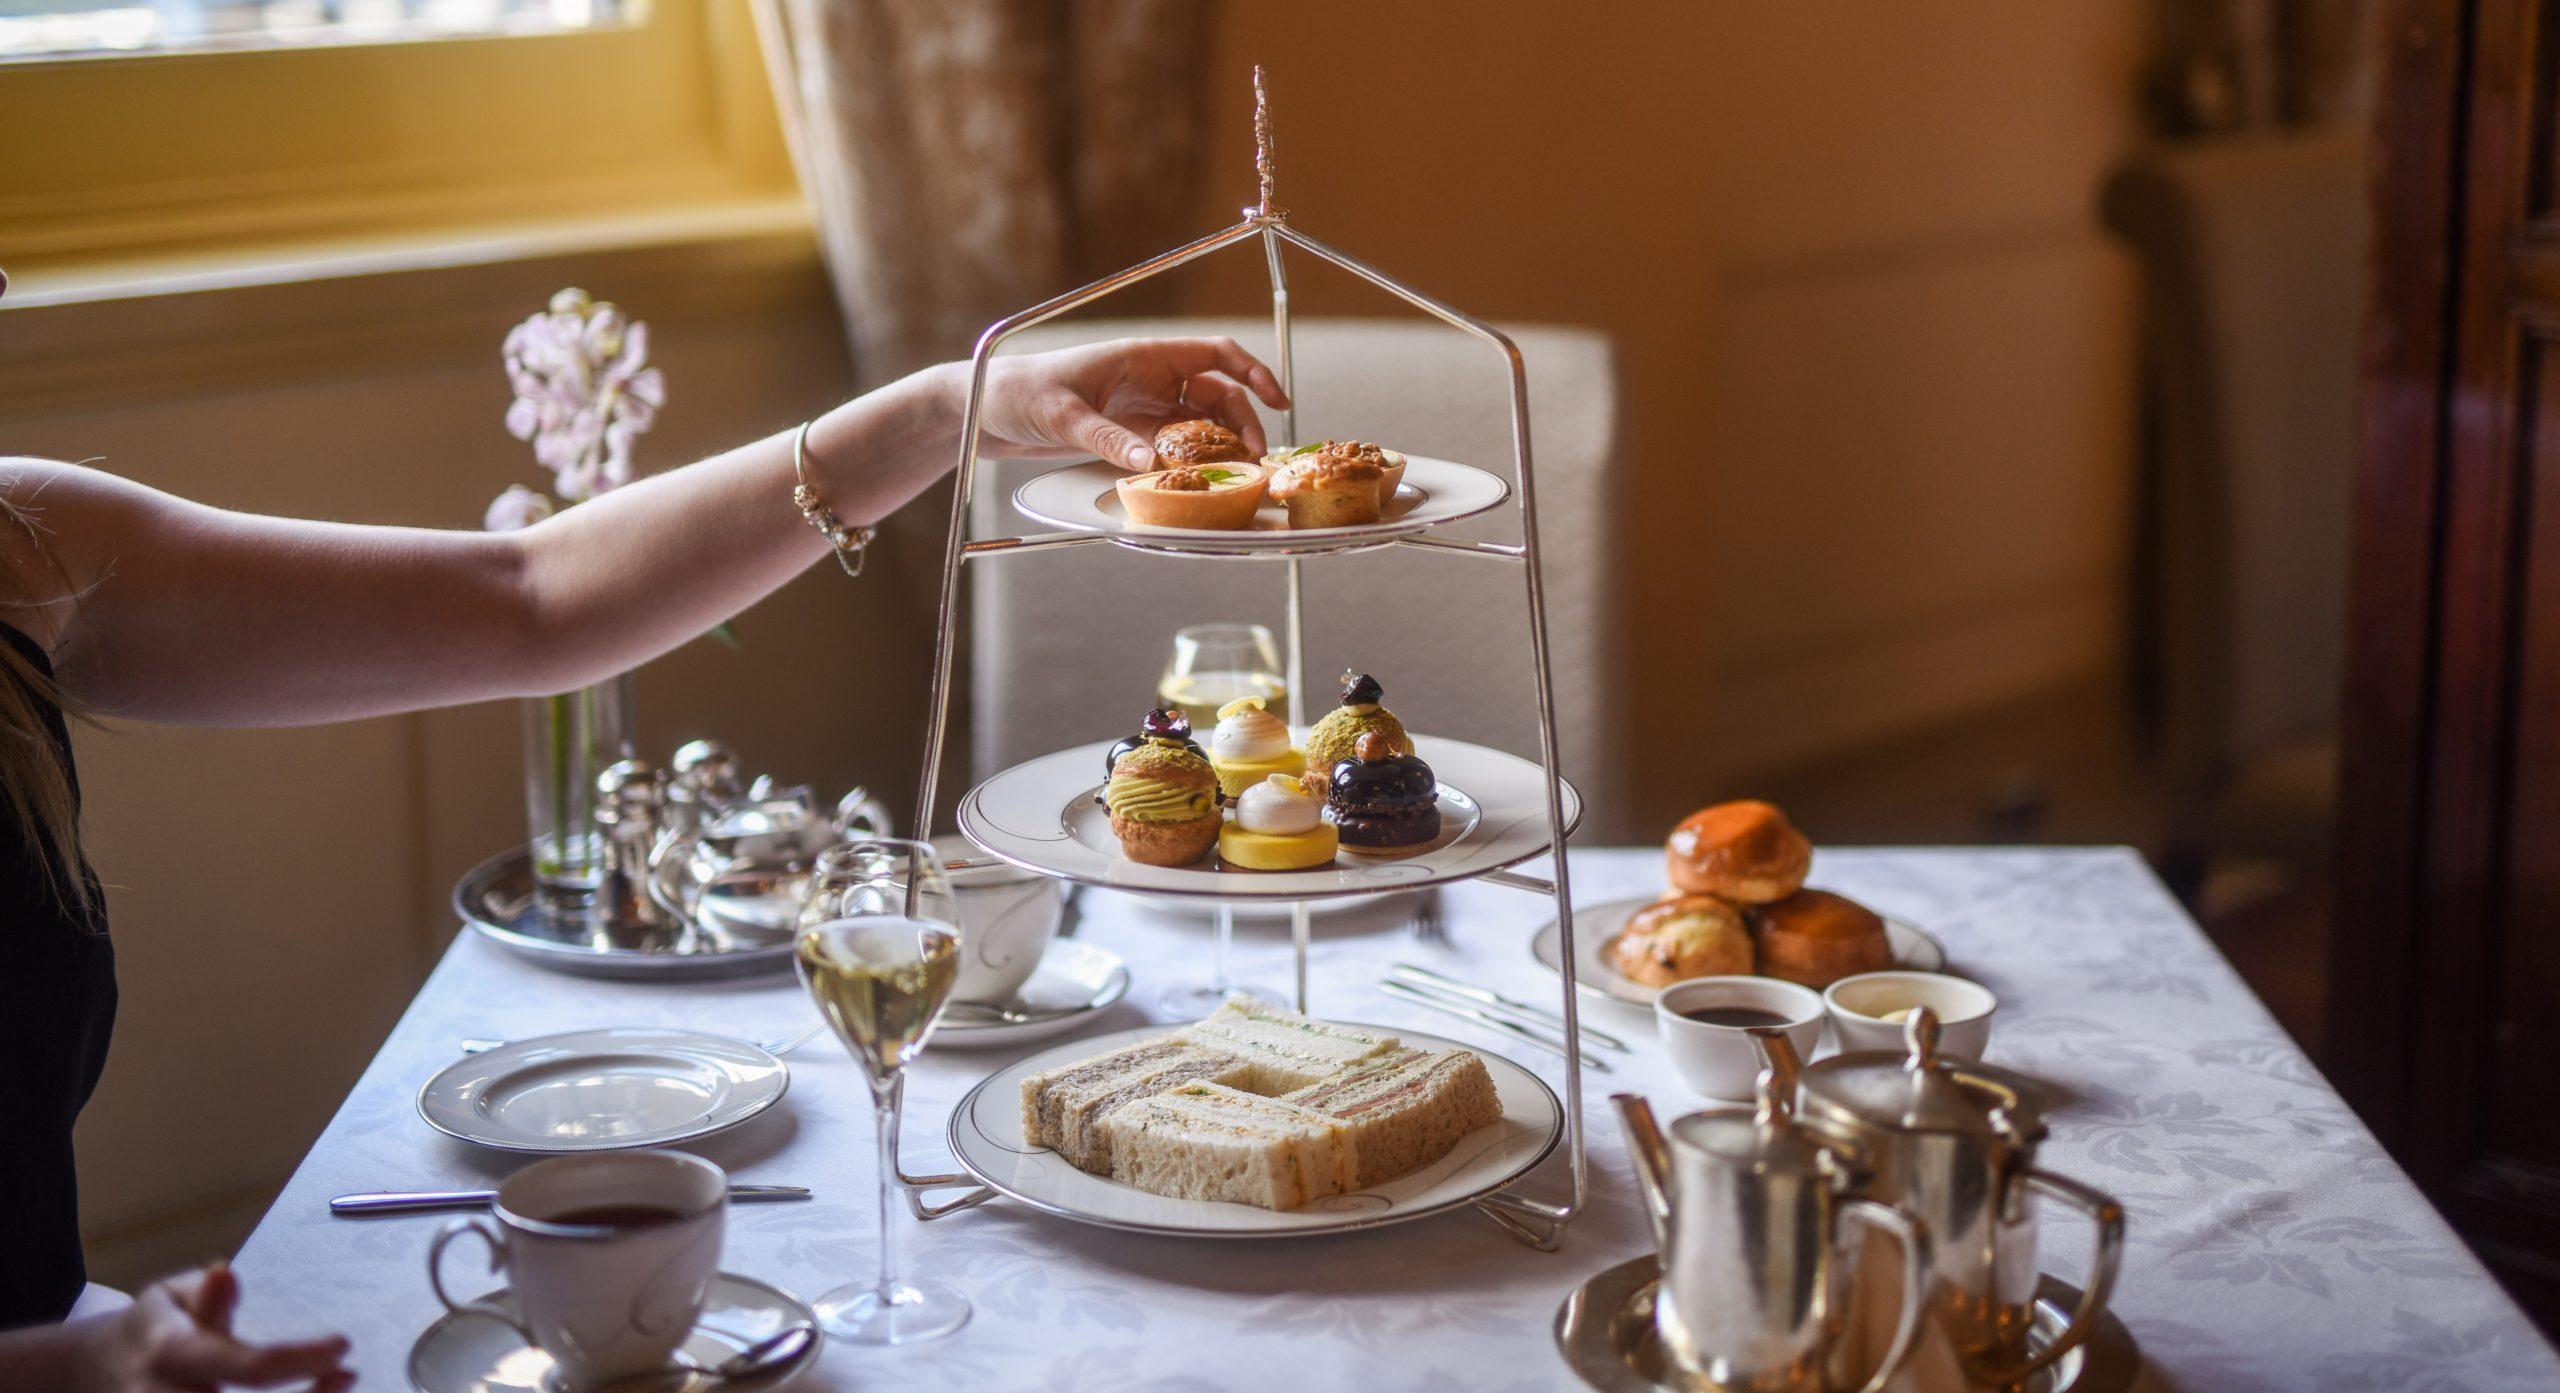 Pressemelding: Afternoon tea, anyone?